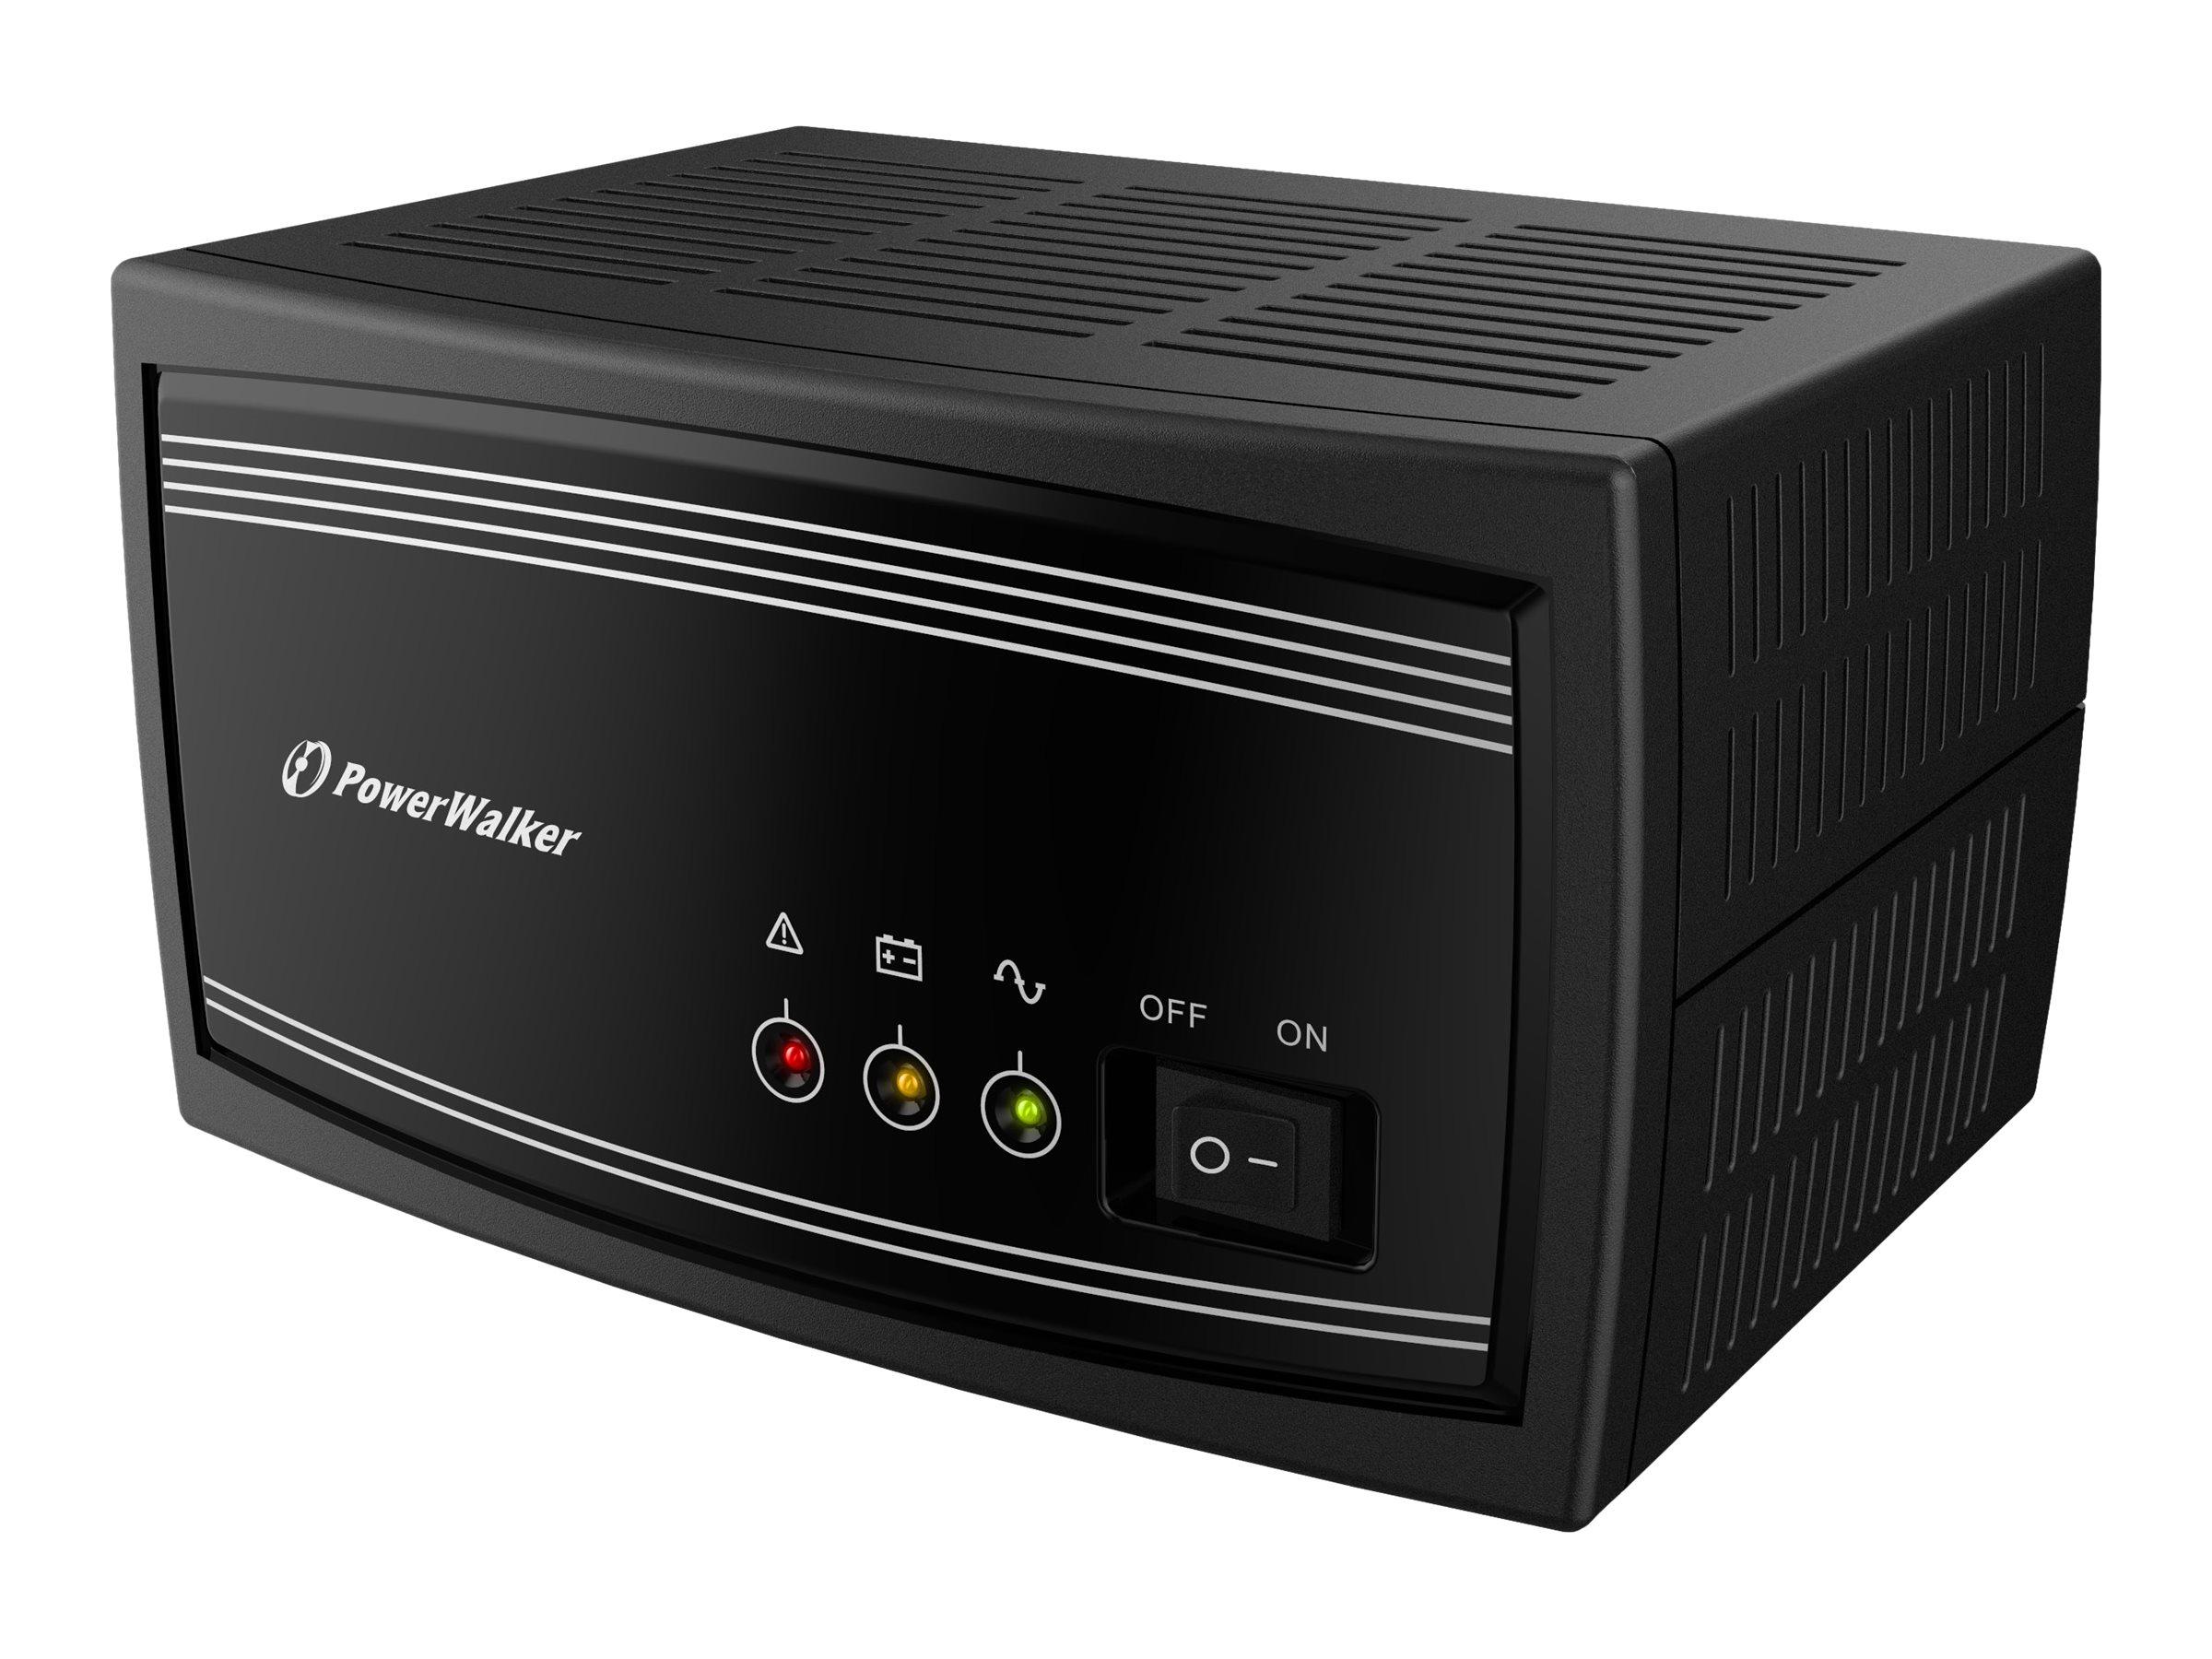 PowerWalker Inverter 650 SW - USV - 325 Watt - 650 VA - ohne Batterie - Ausgangsanschlüsse: 1